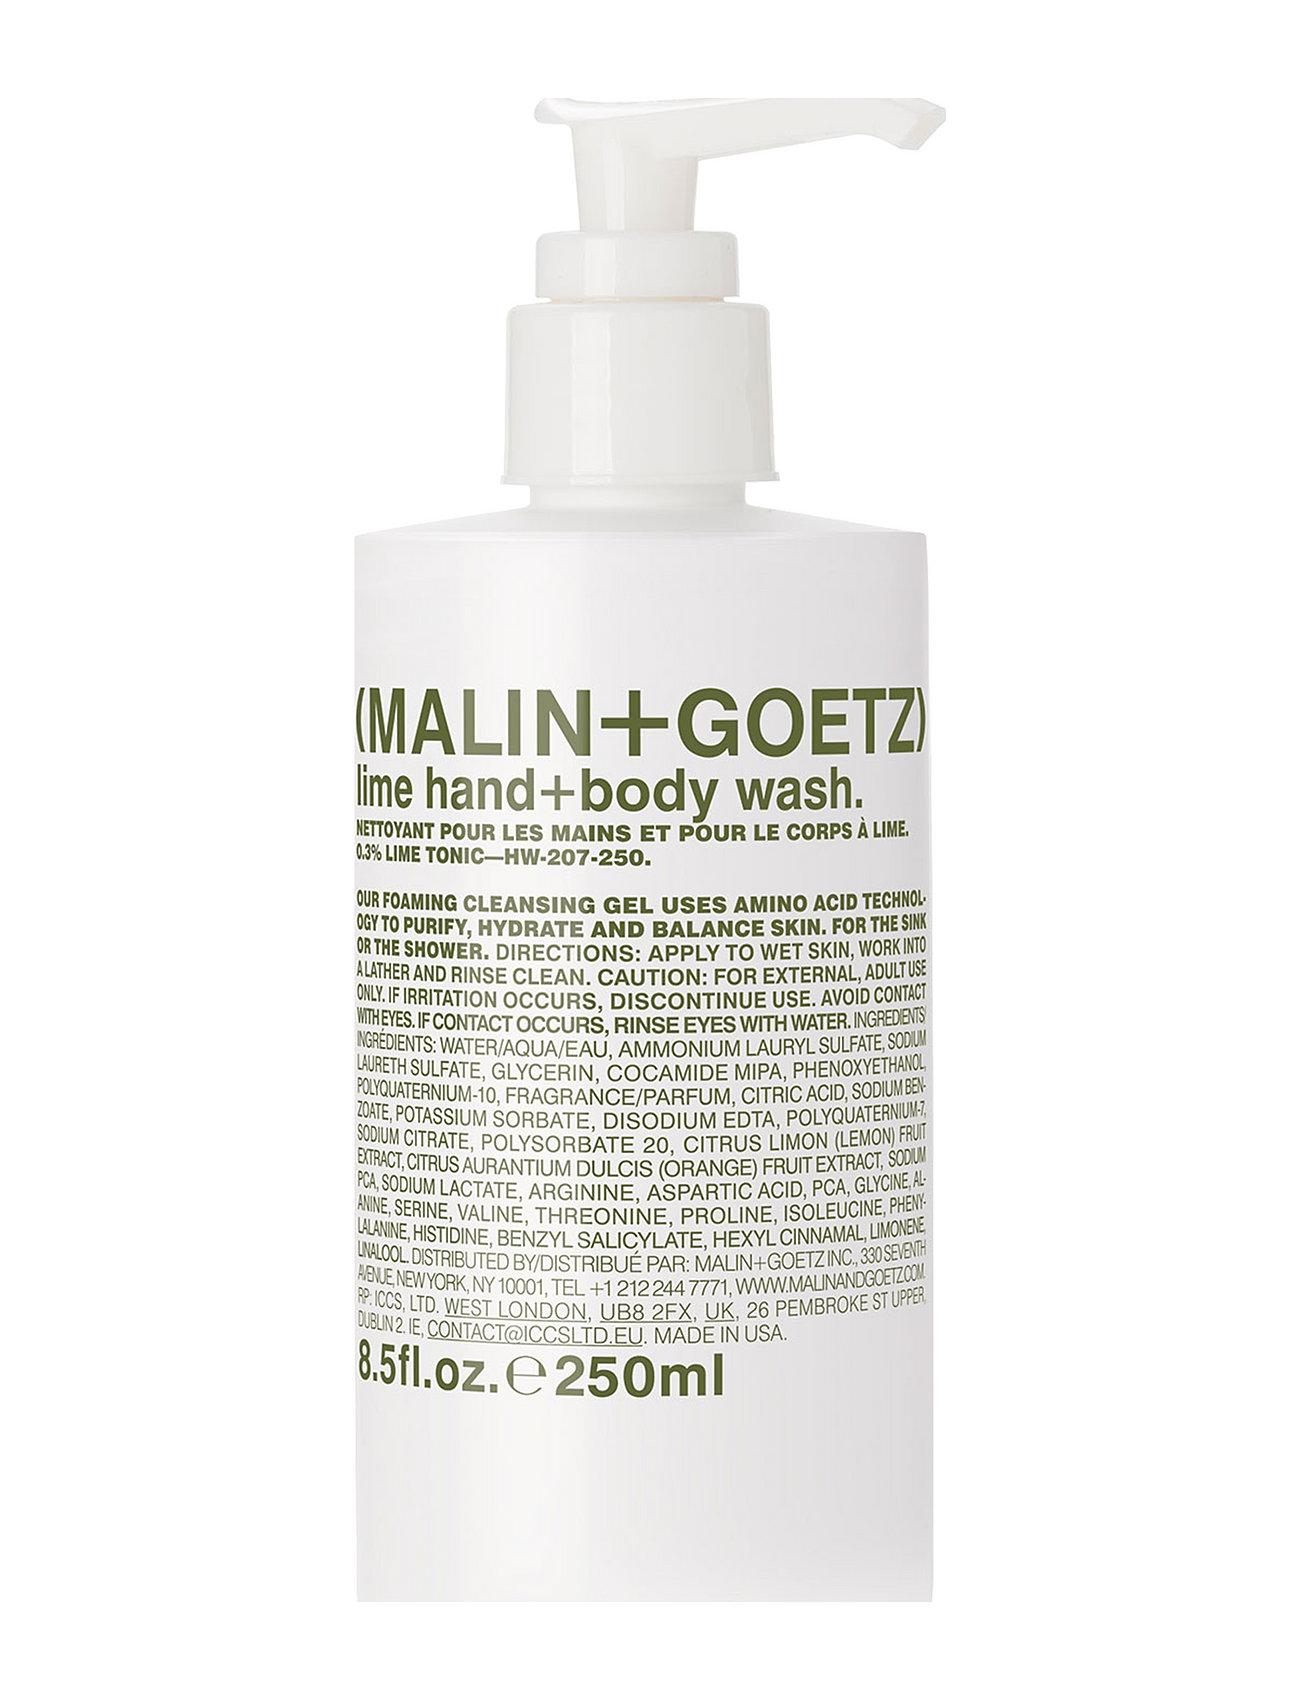 malin+goetz – Lime hand + body wash fra boozt.com dk